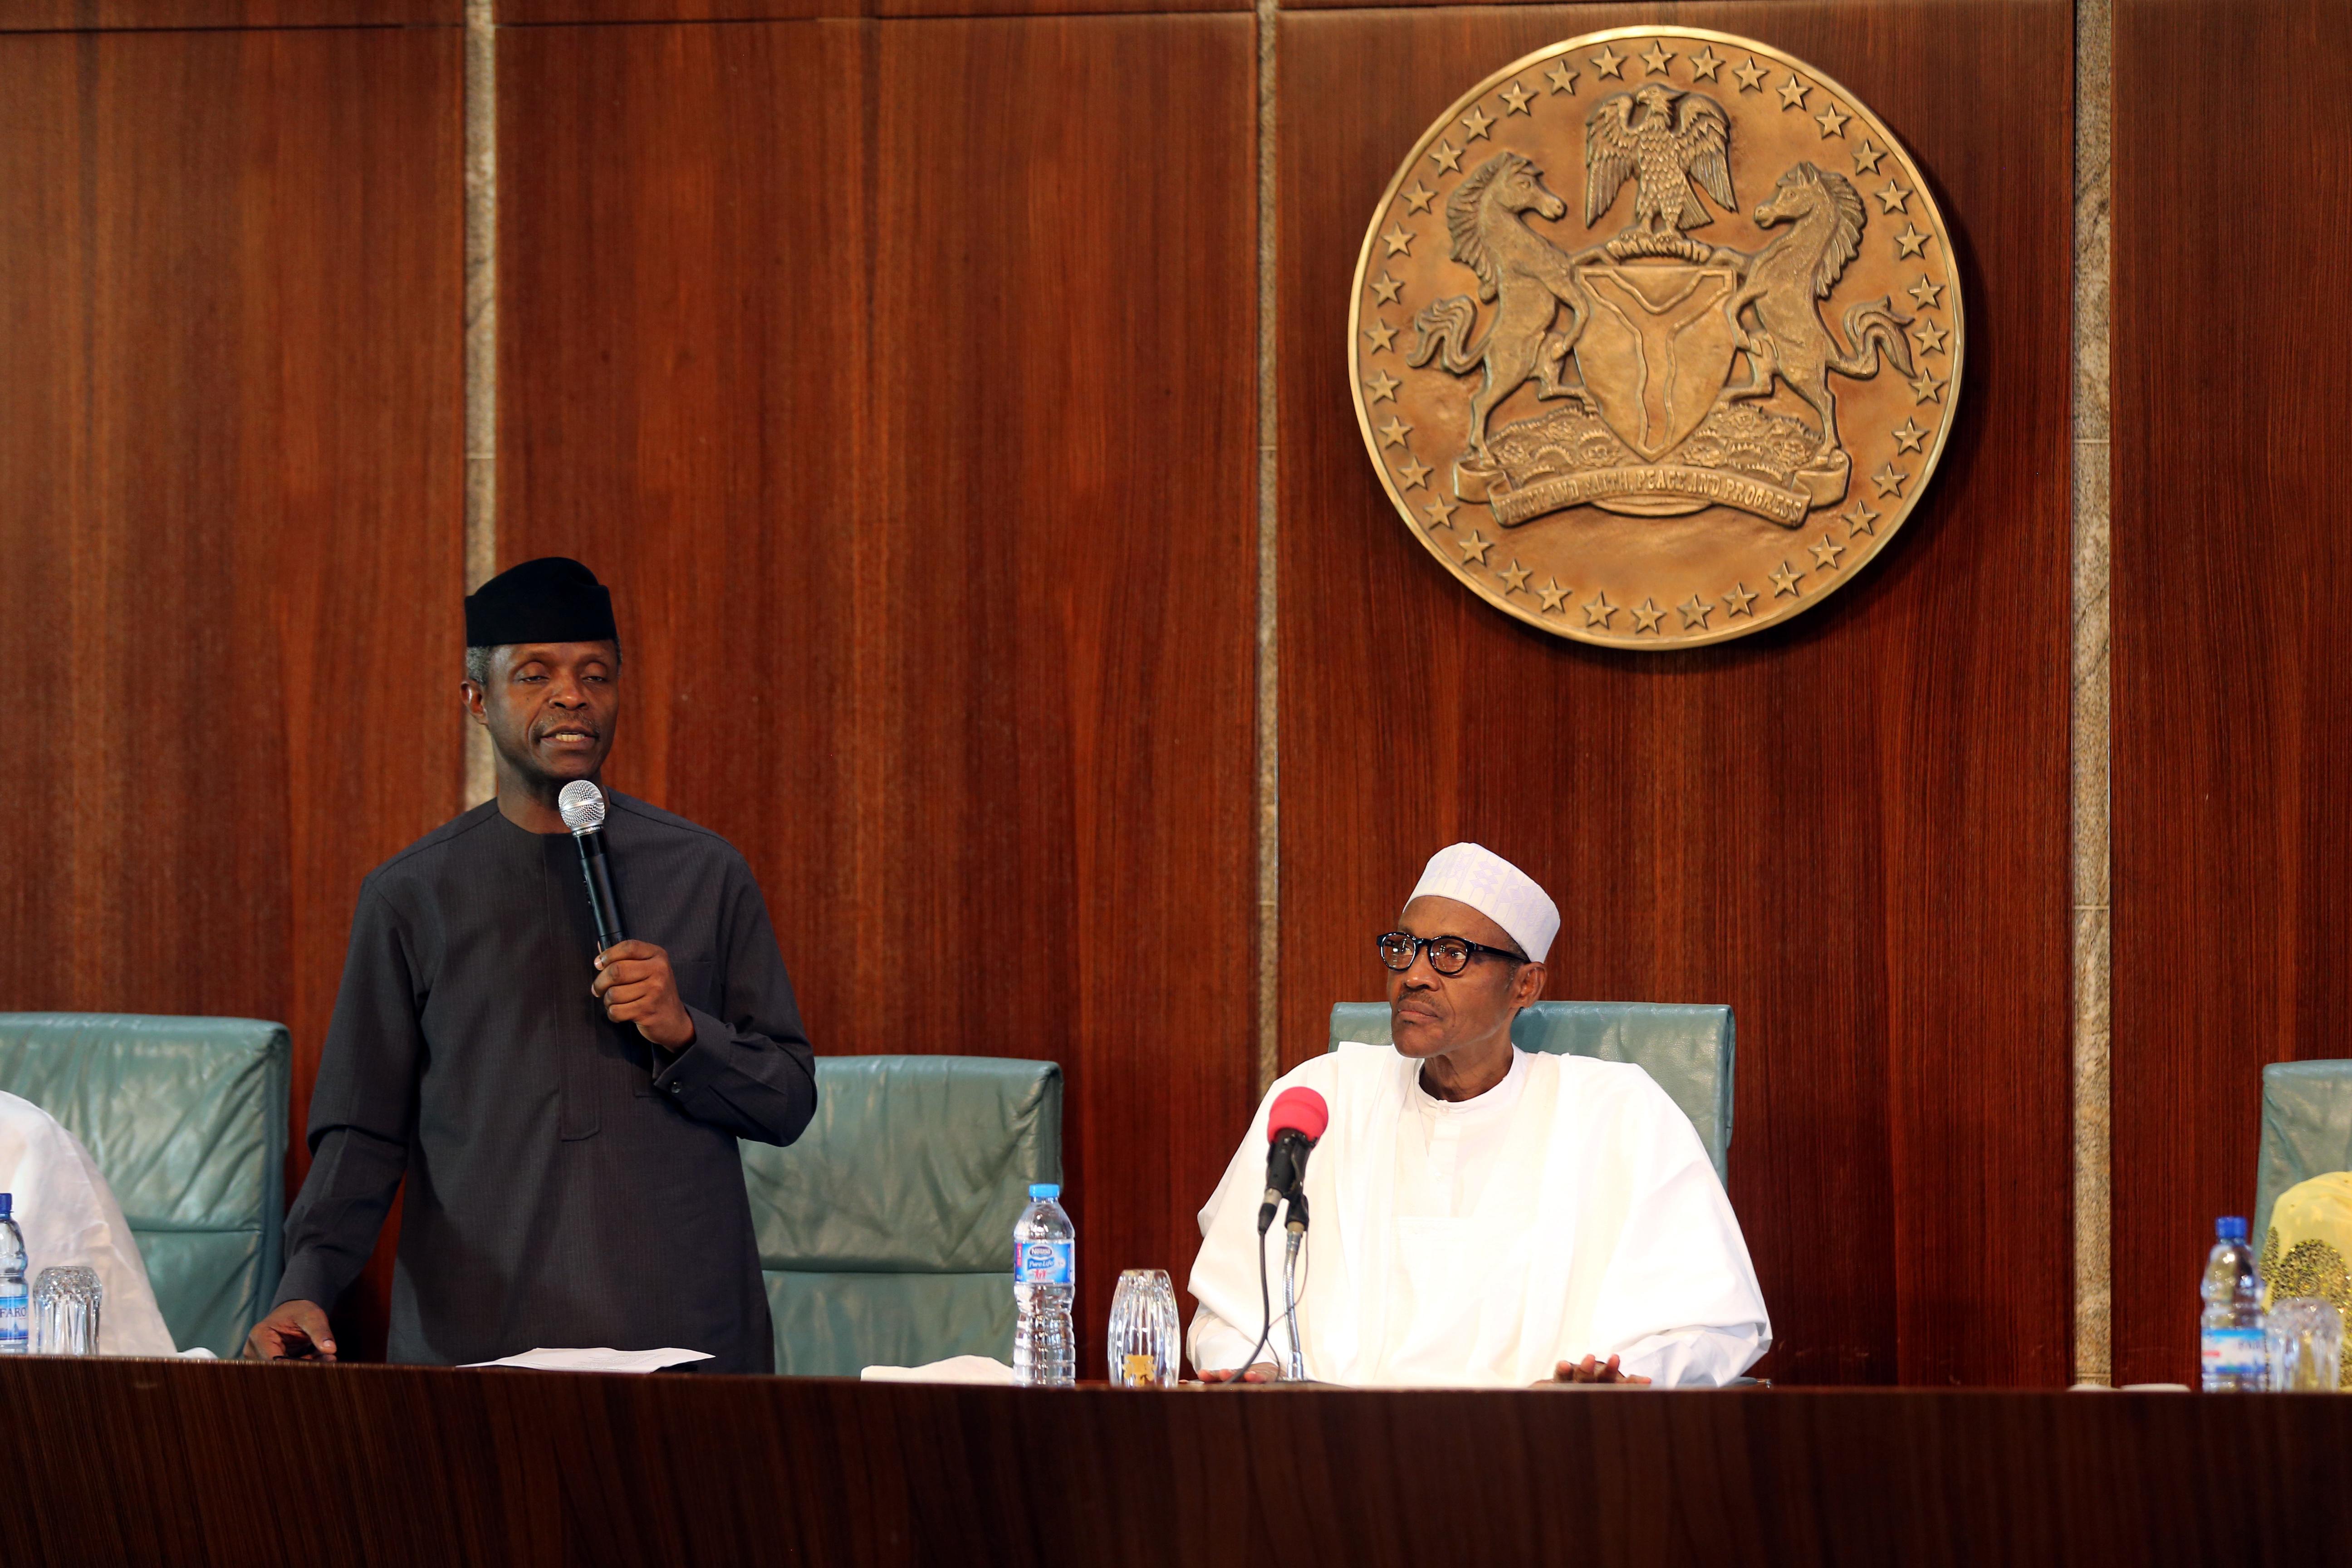 Nigeria elections: Buhari denies third term bid